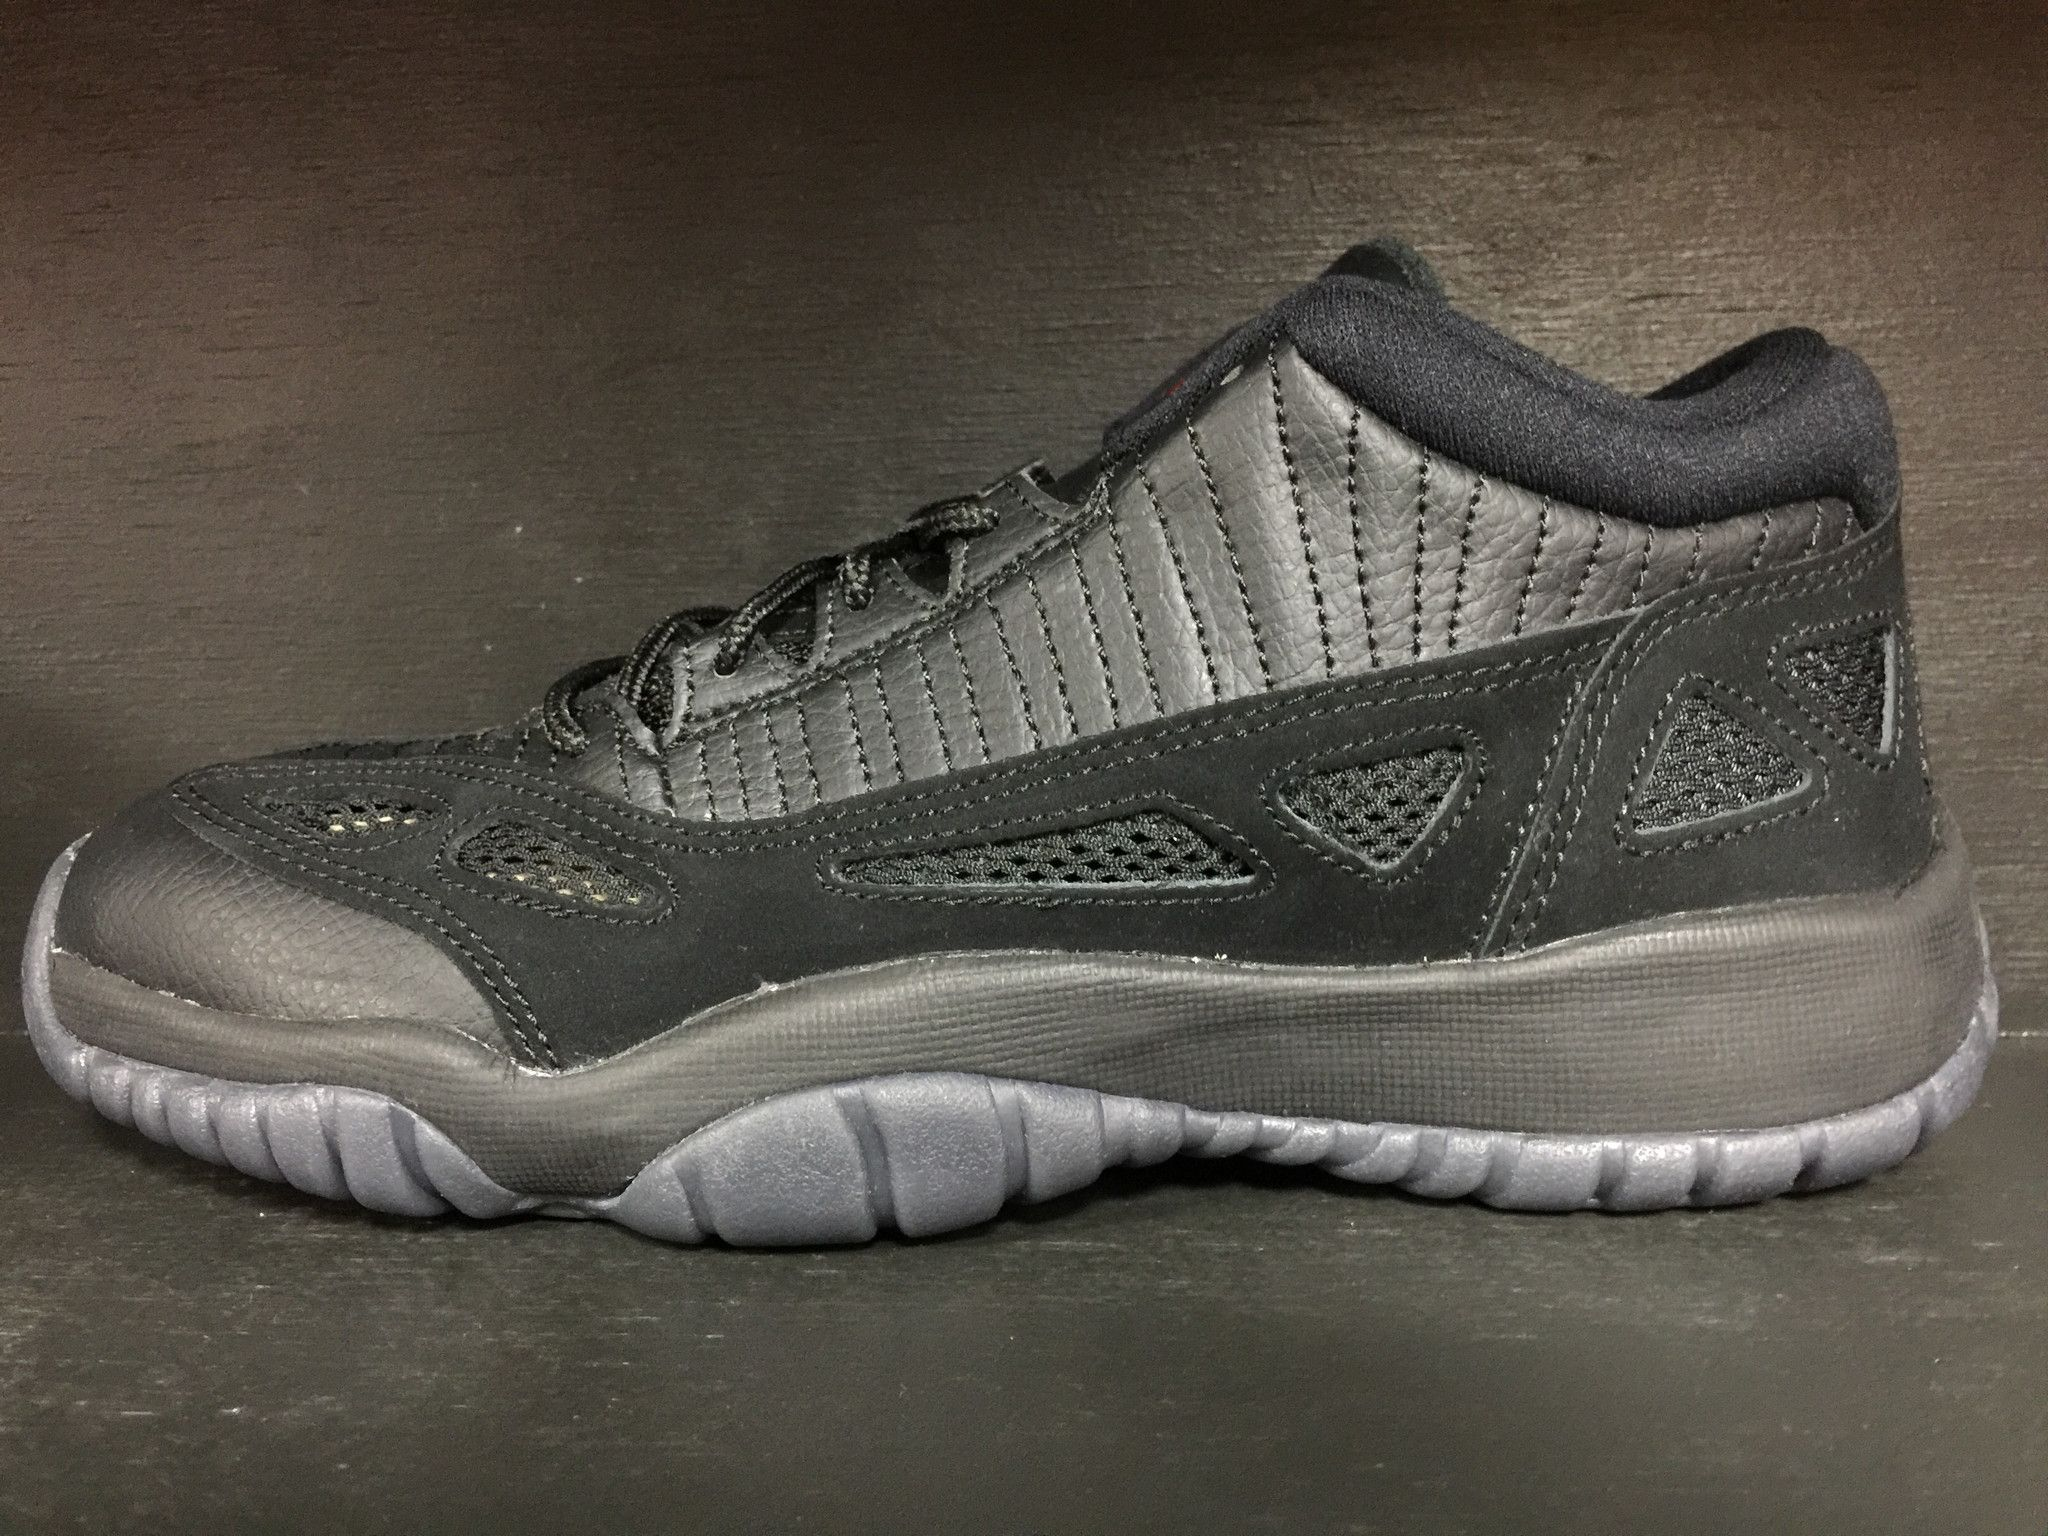 pretty nice 4eaef b1493 Air Jordan 11 Retro Ie Low  Referee  Popular Sneakers, Huarache Run, Sneaker